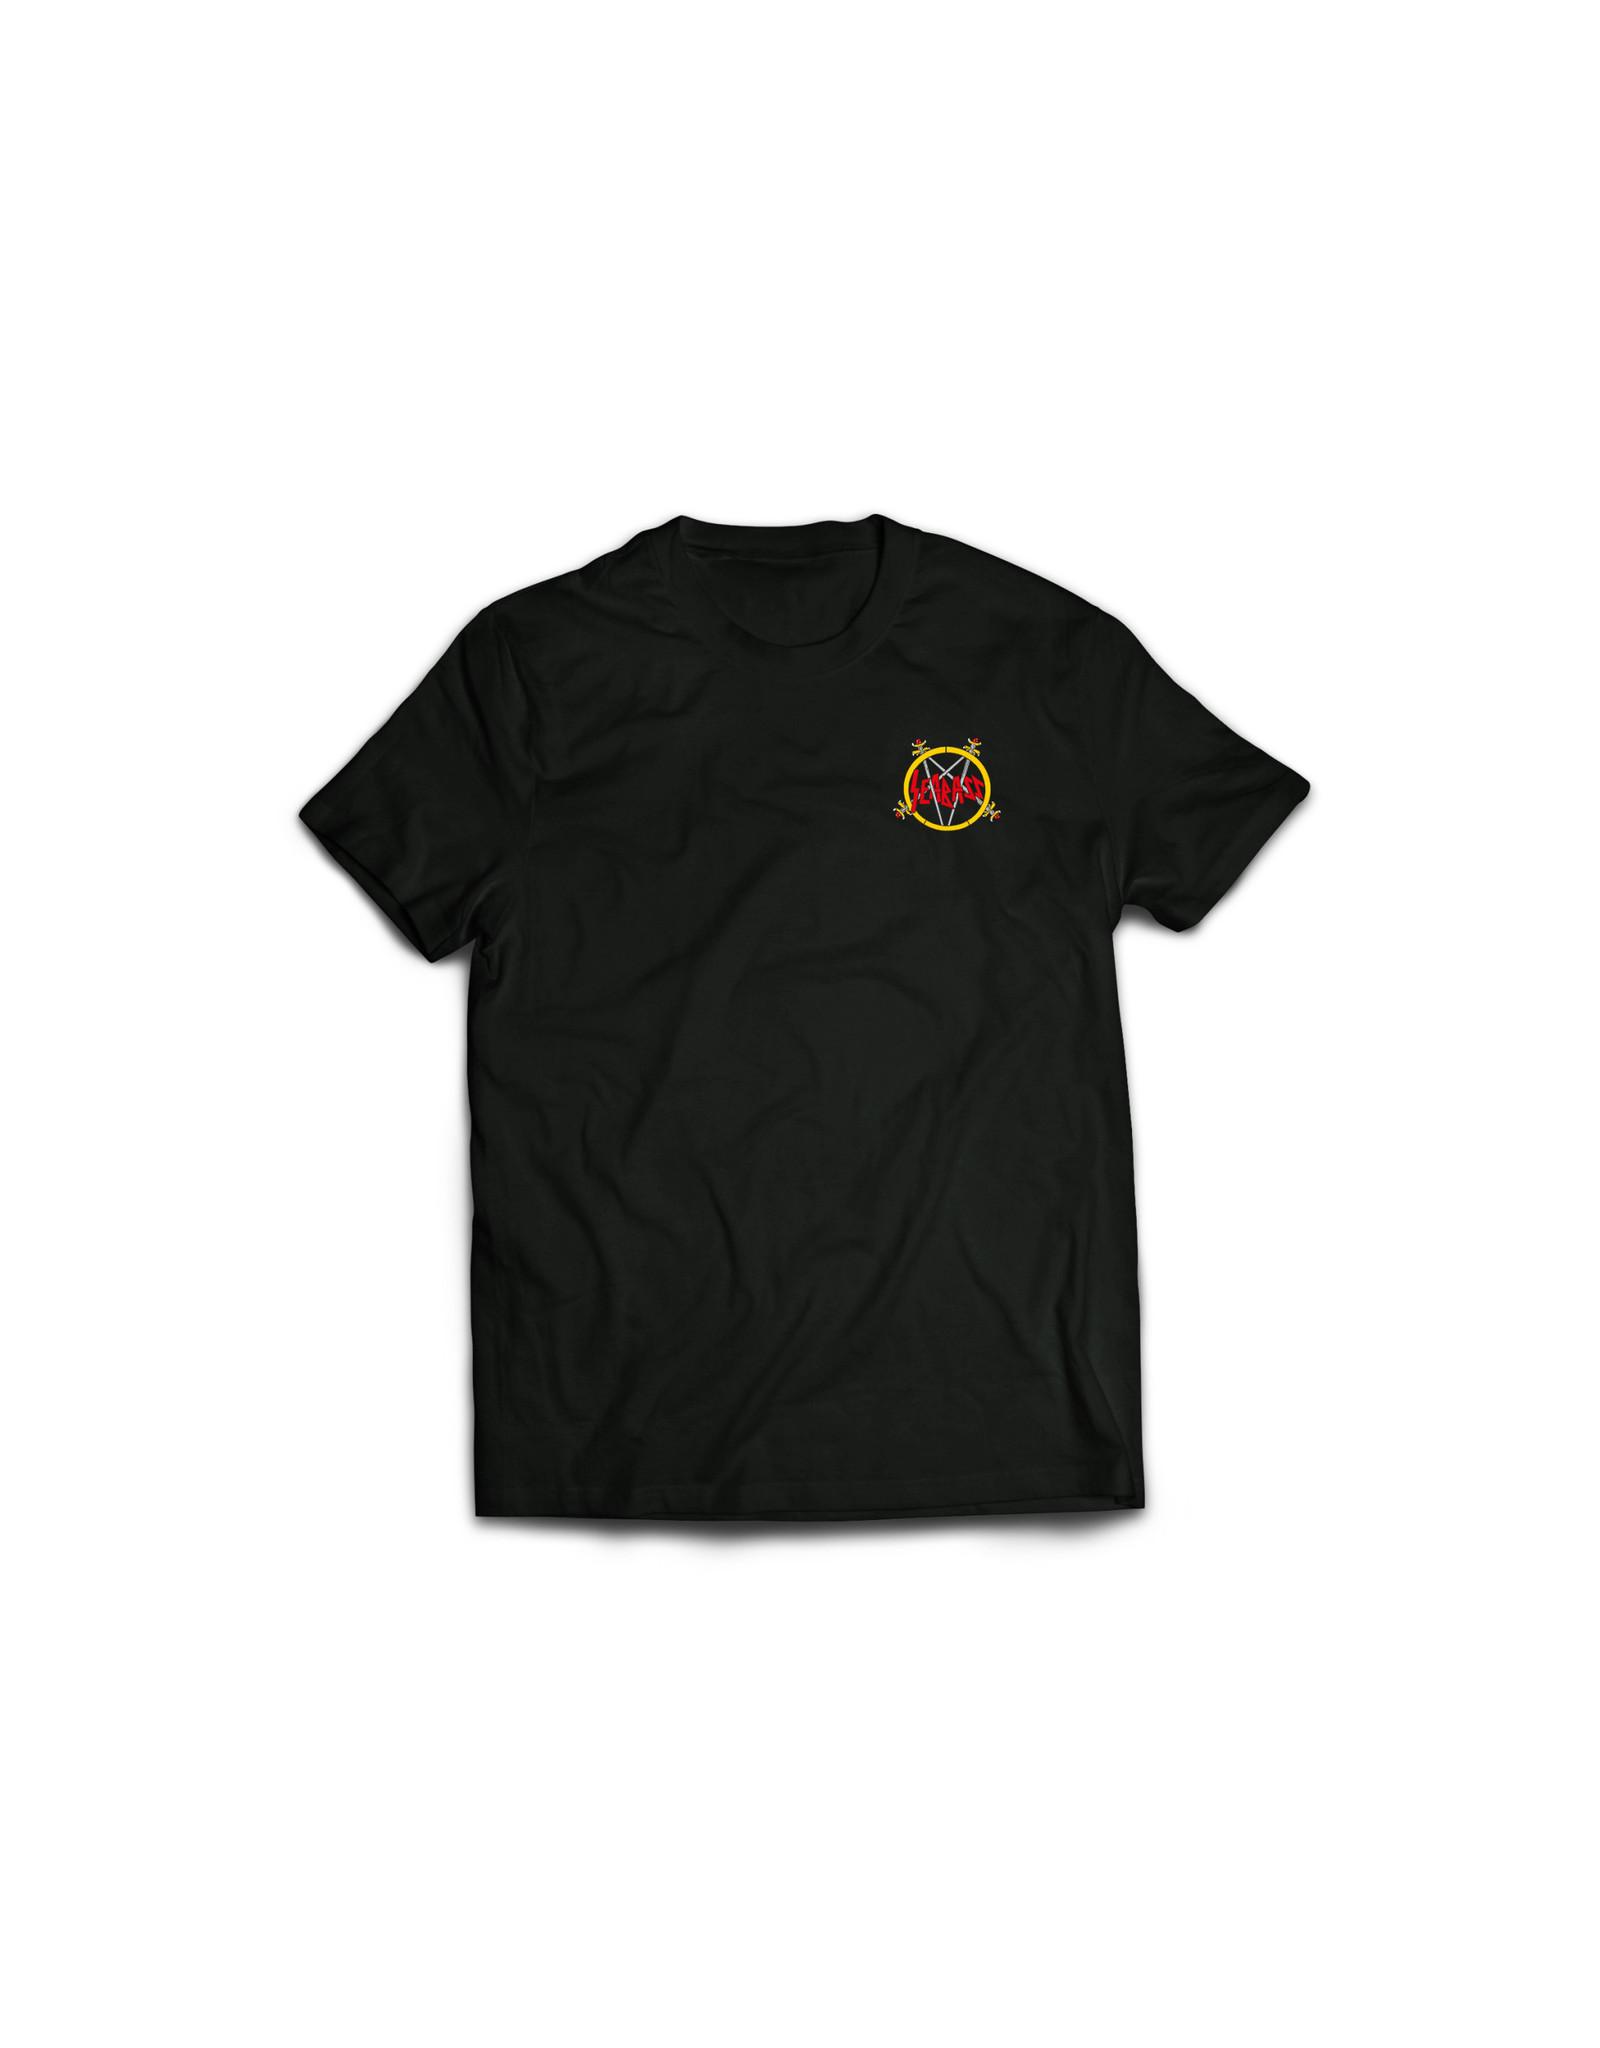 Seabass Cycles Seabass Cycles - Slayer T-Shirt - Black